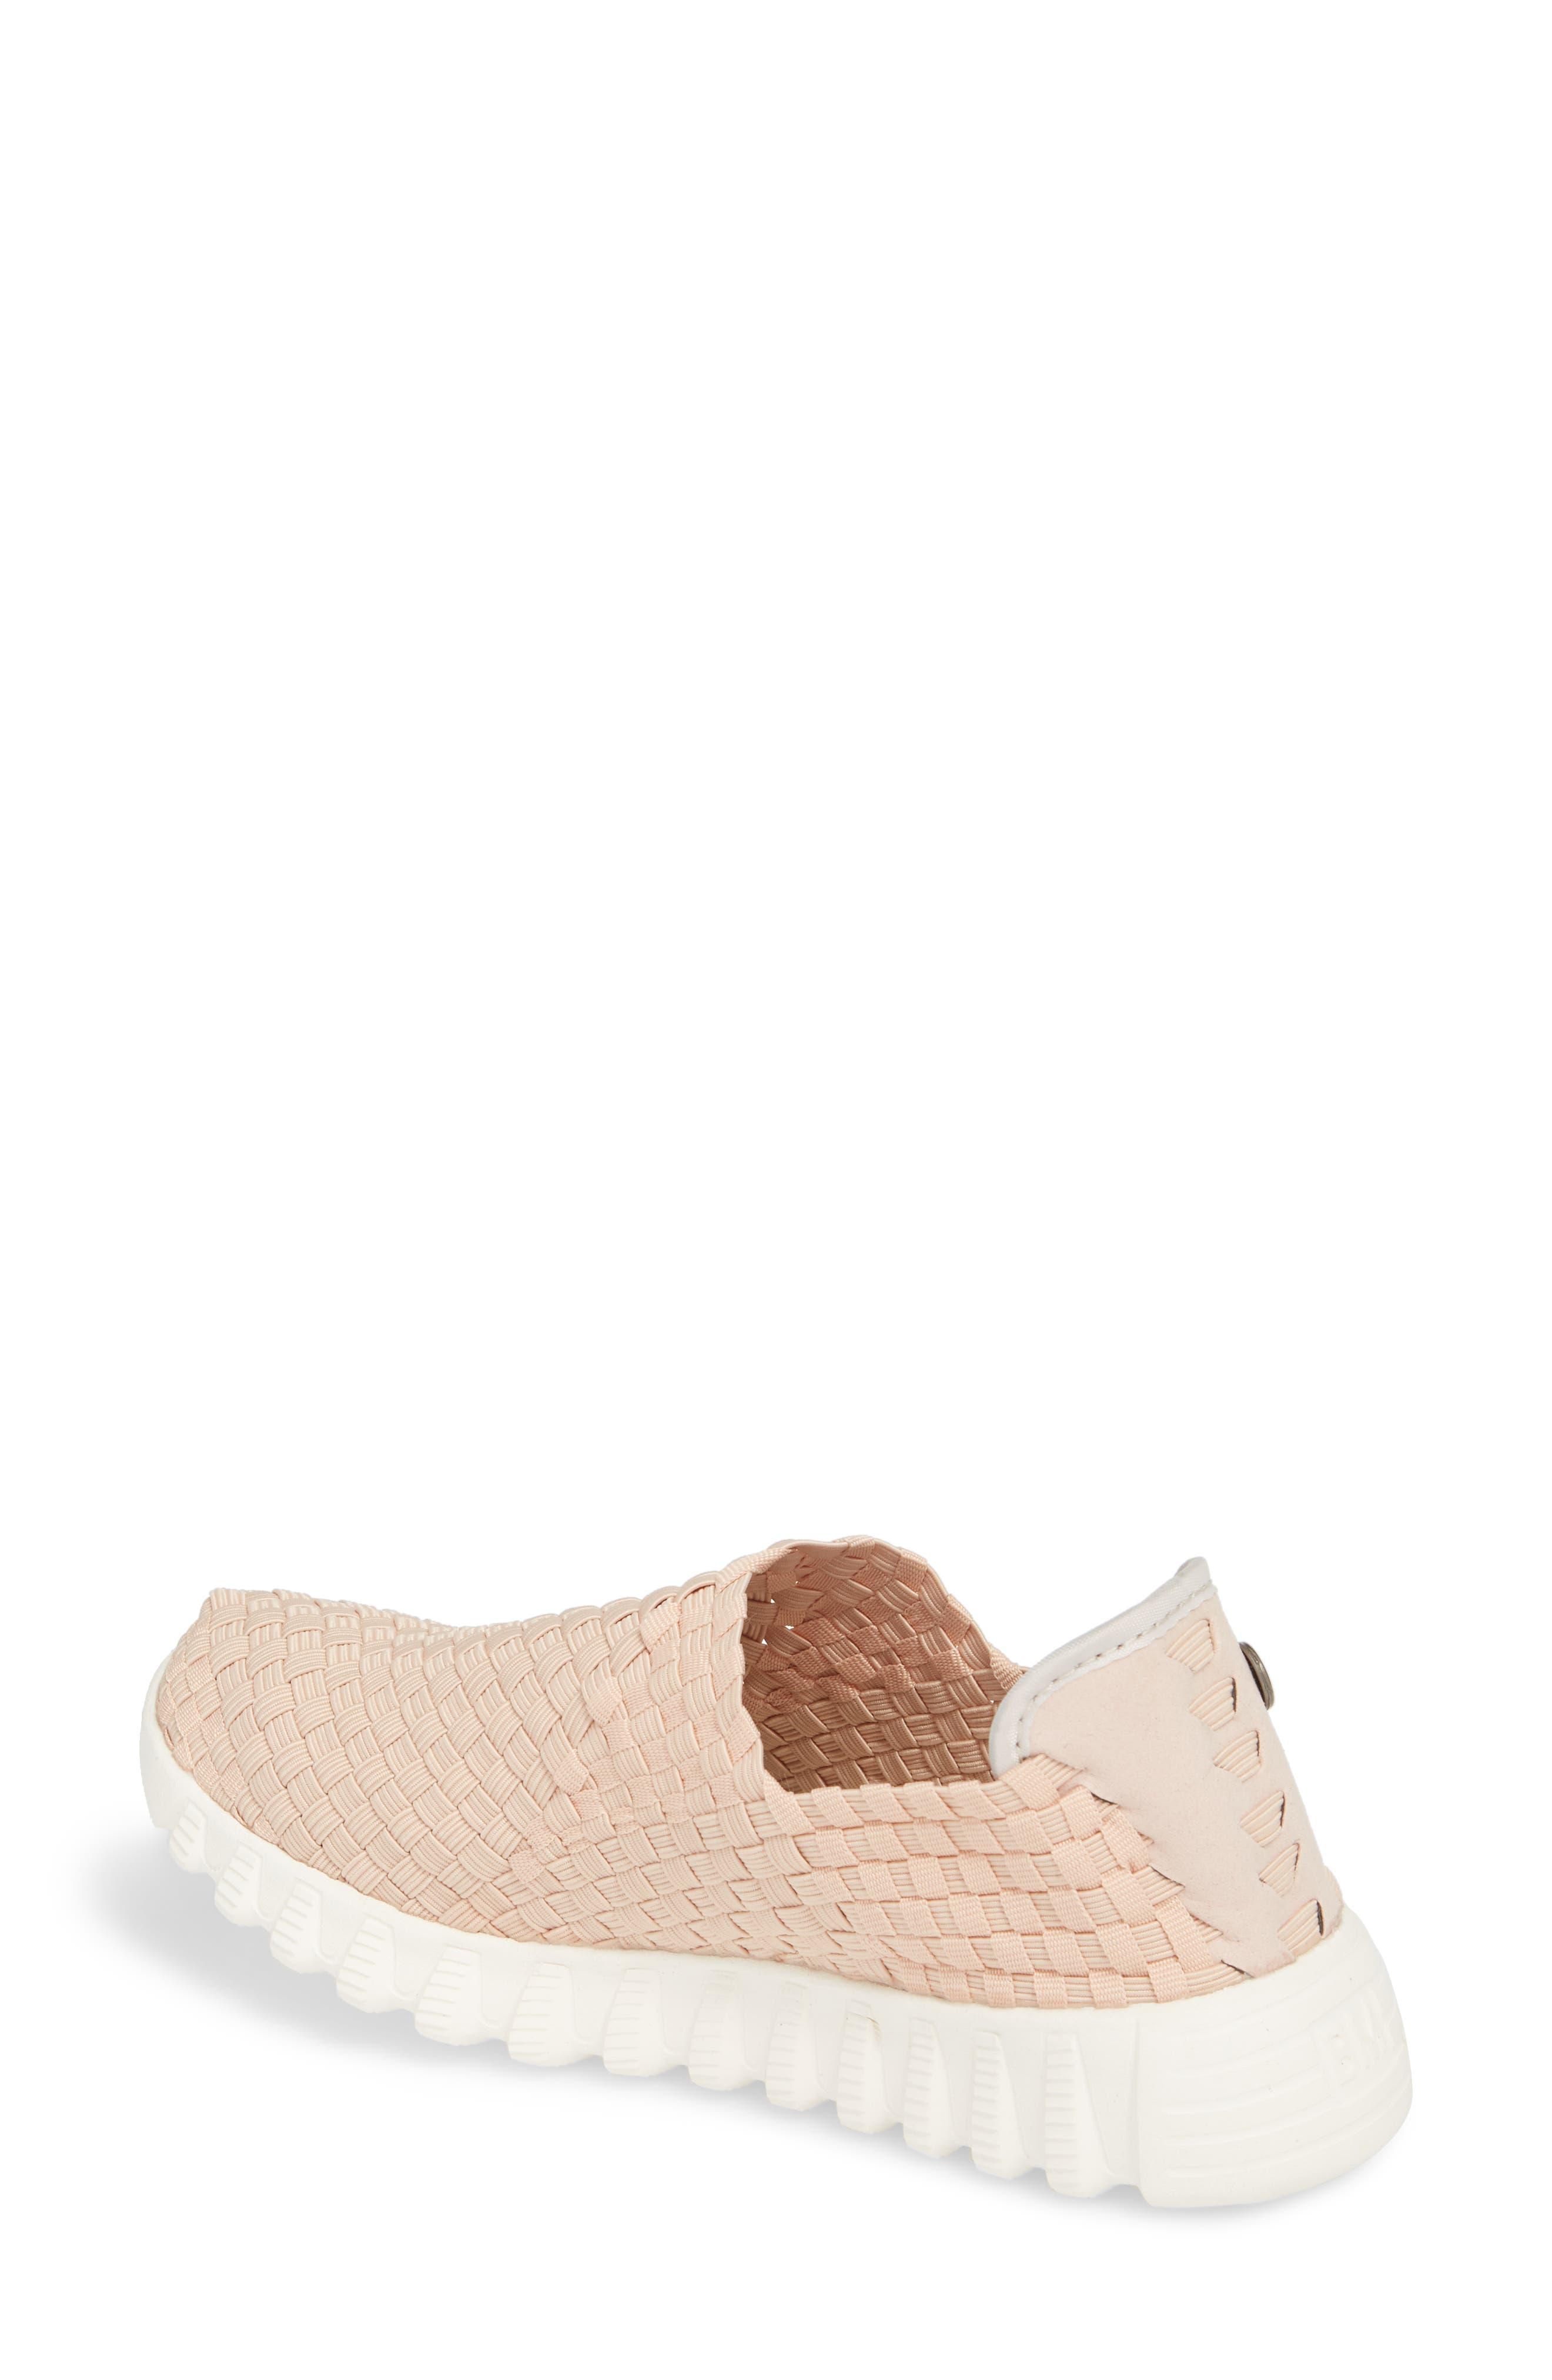 Woven Slip-On Sneaker,                             Alternate thumbnail 2, color,                             Blush Fabric